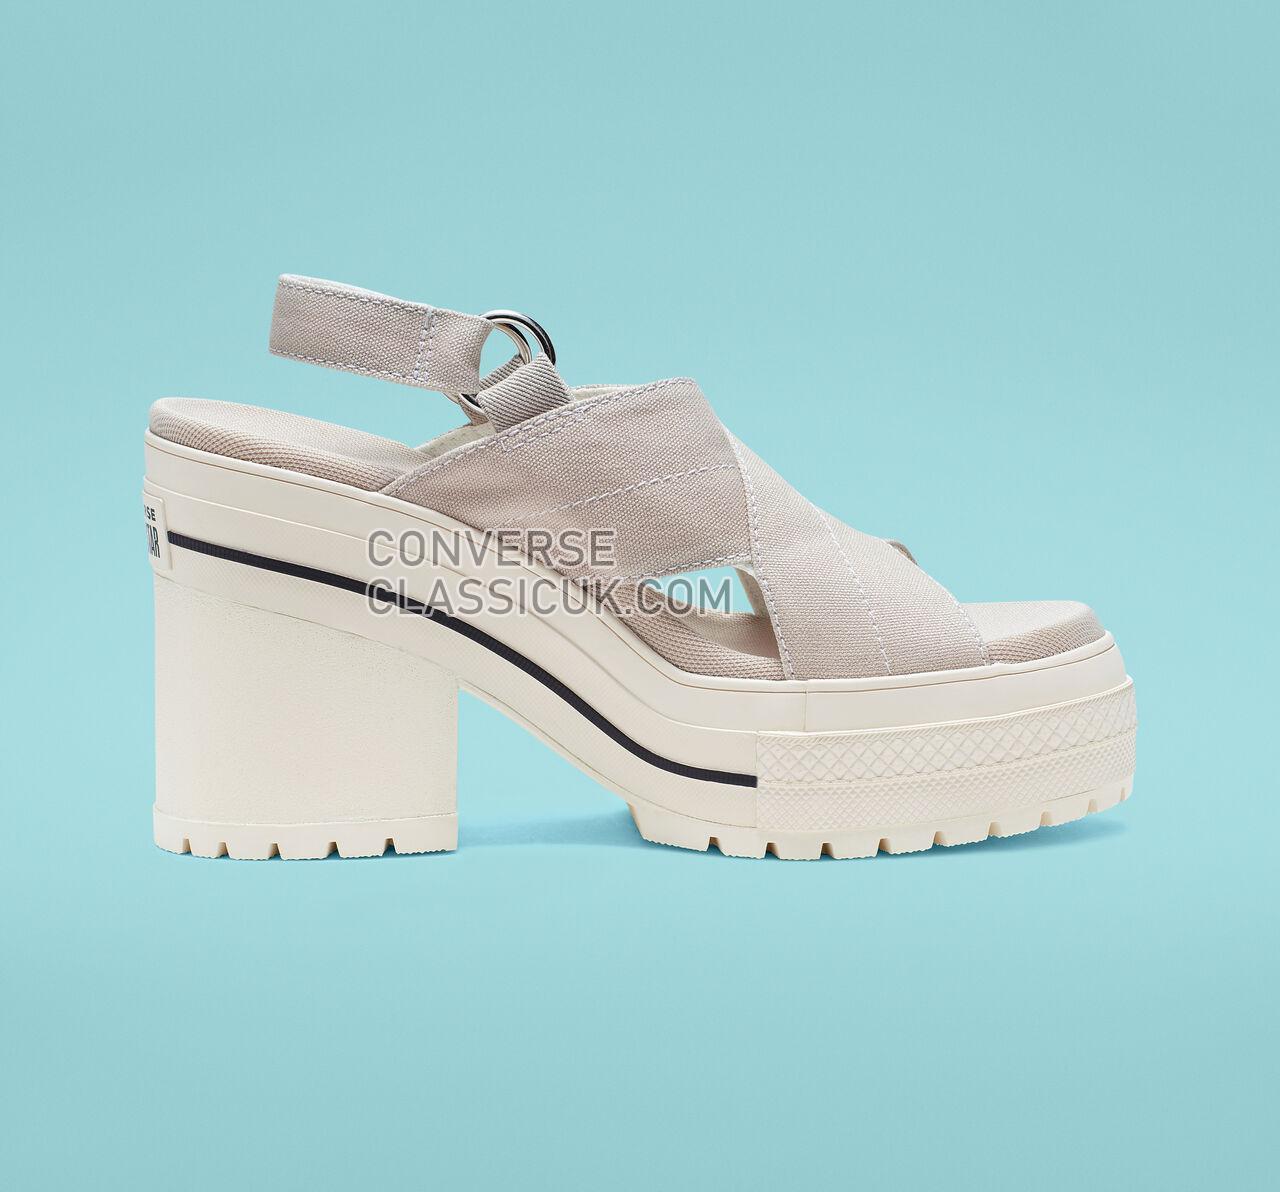 Converse One Star Boardwalk Strut Womens 564140C Papyrus/Black/Egret Shoes